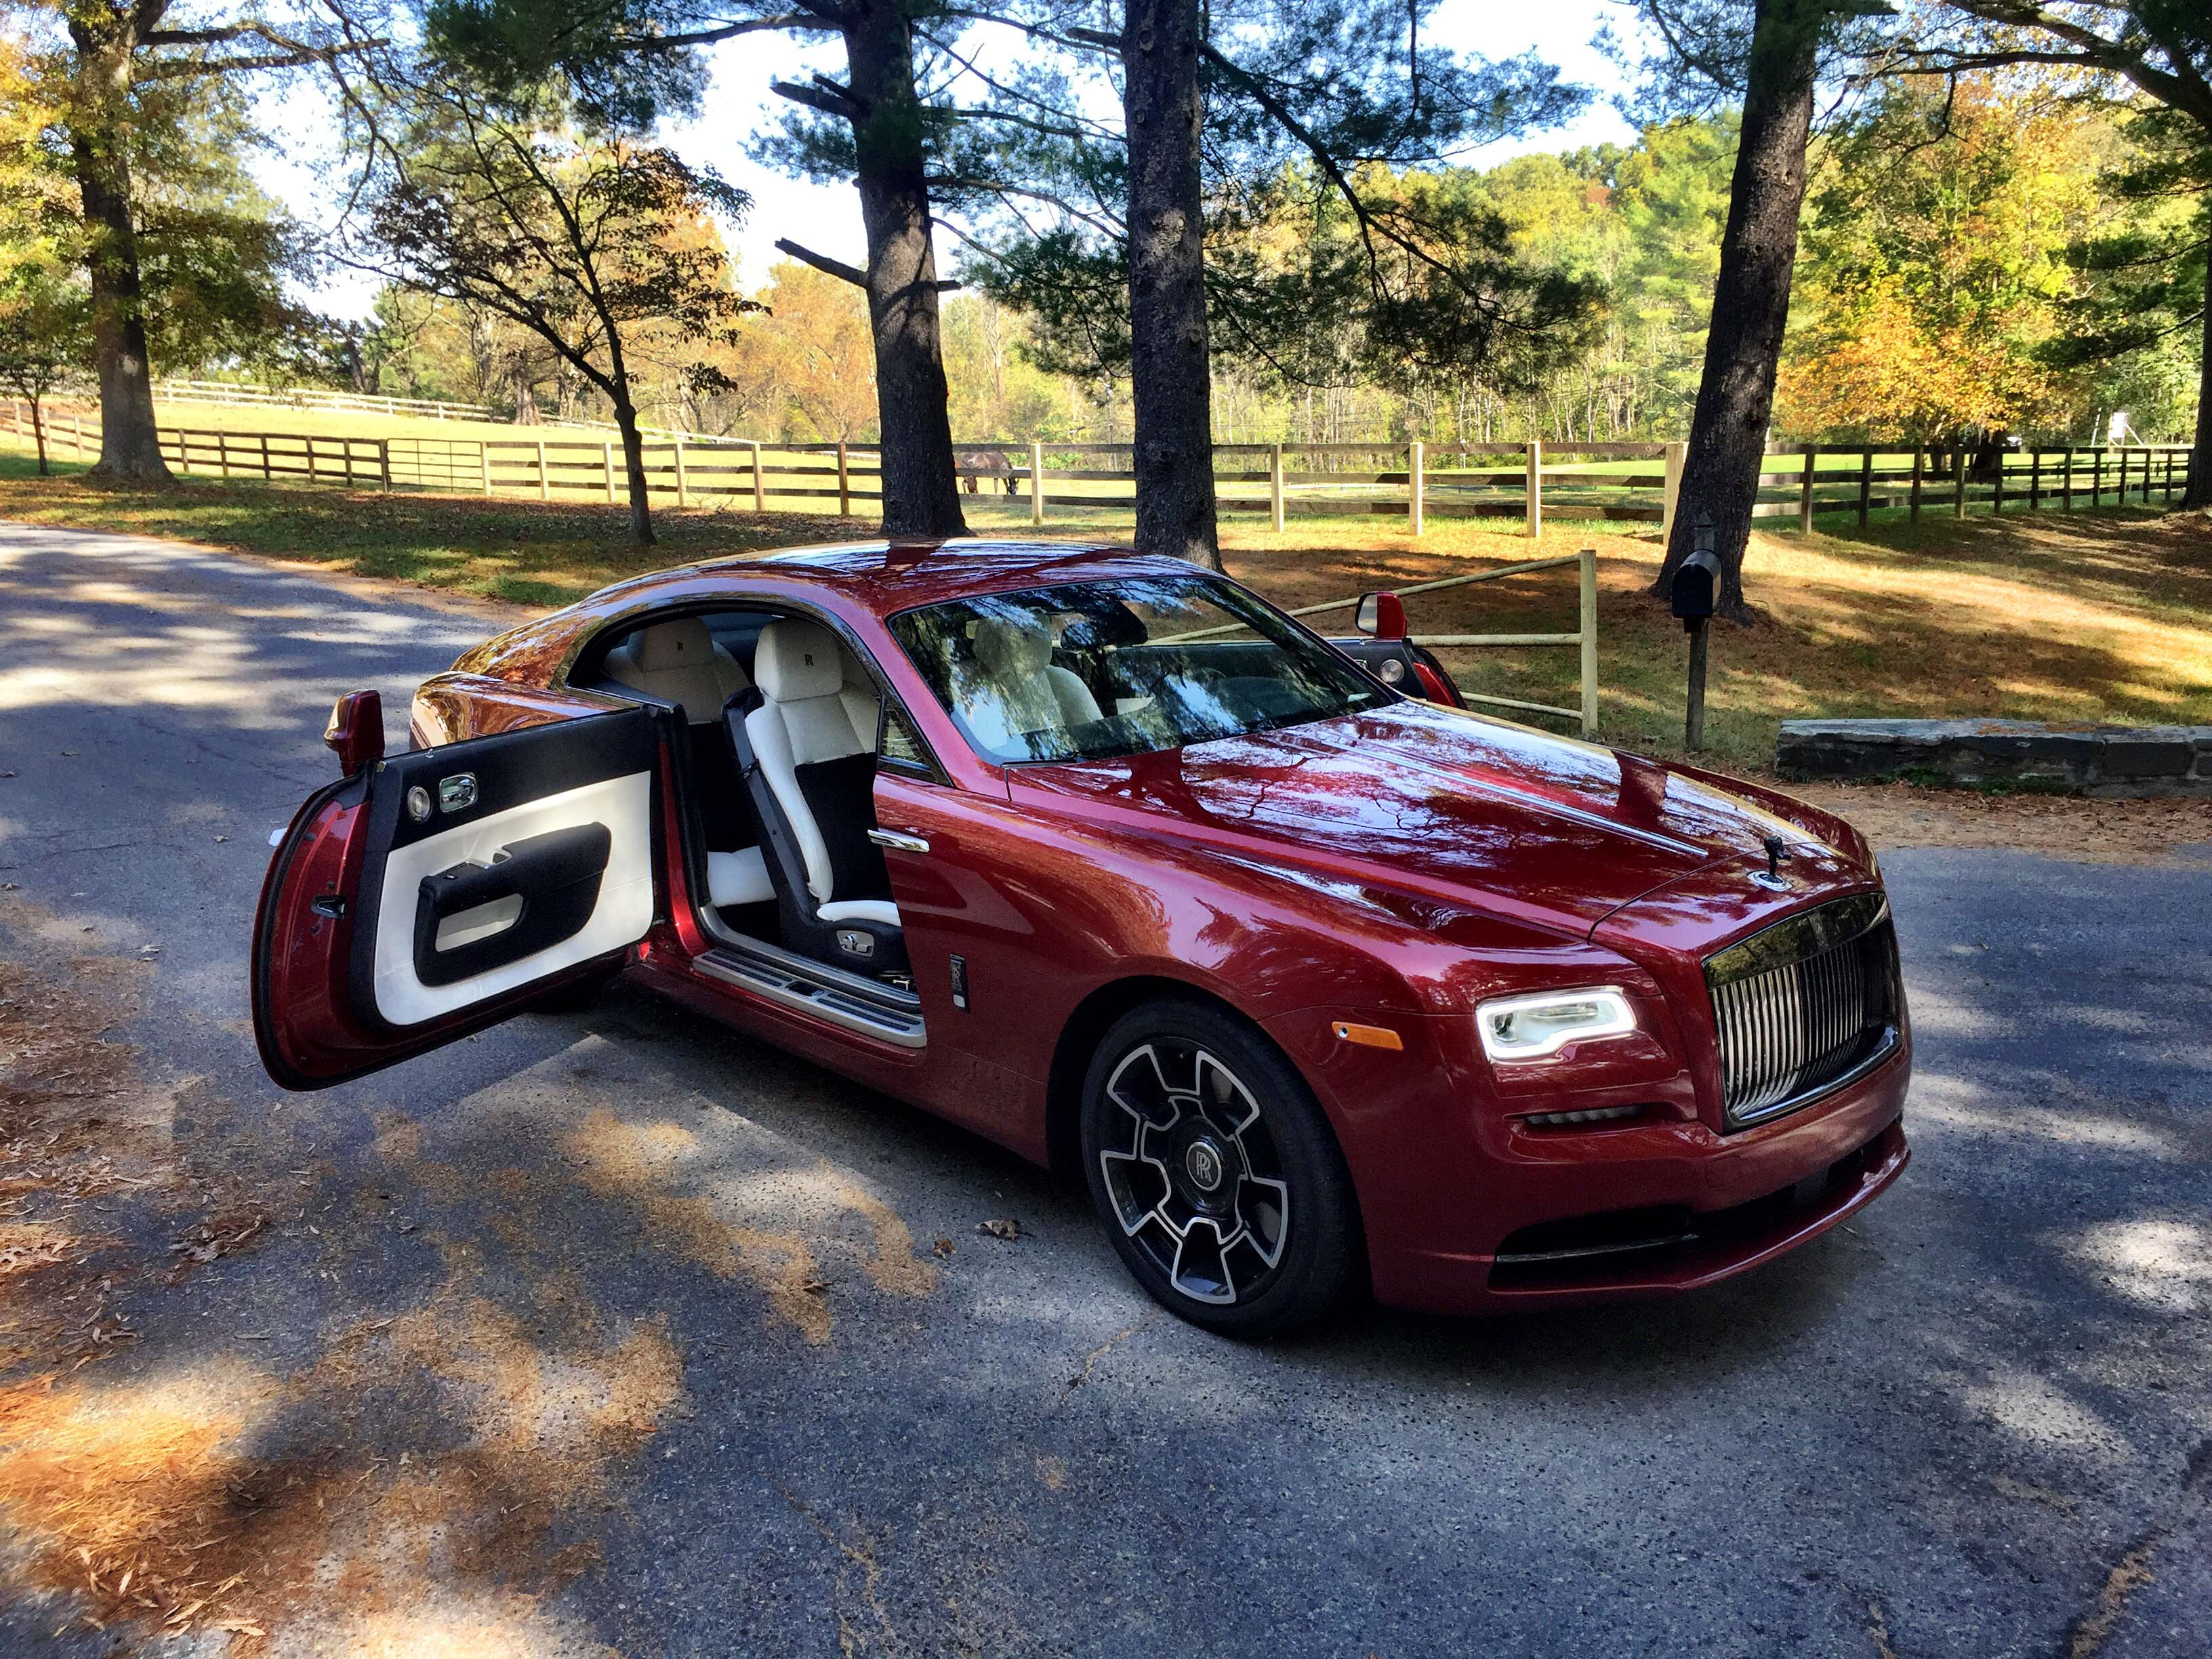 2017 rolls-royce wraith black badge: it's the business | automotive